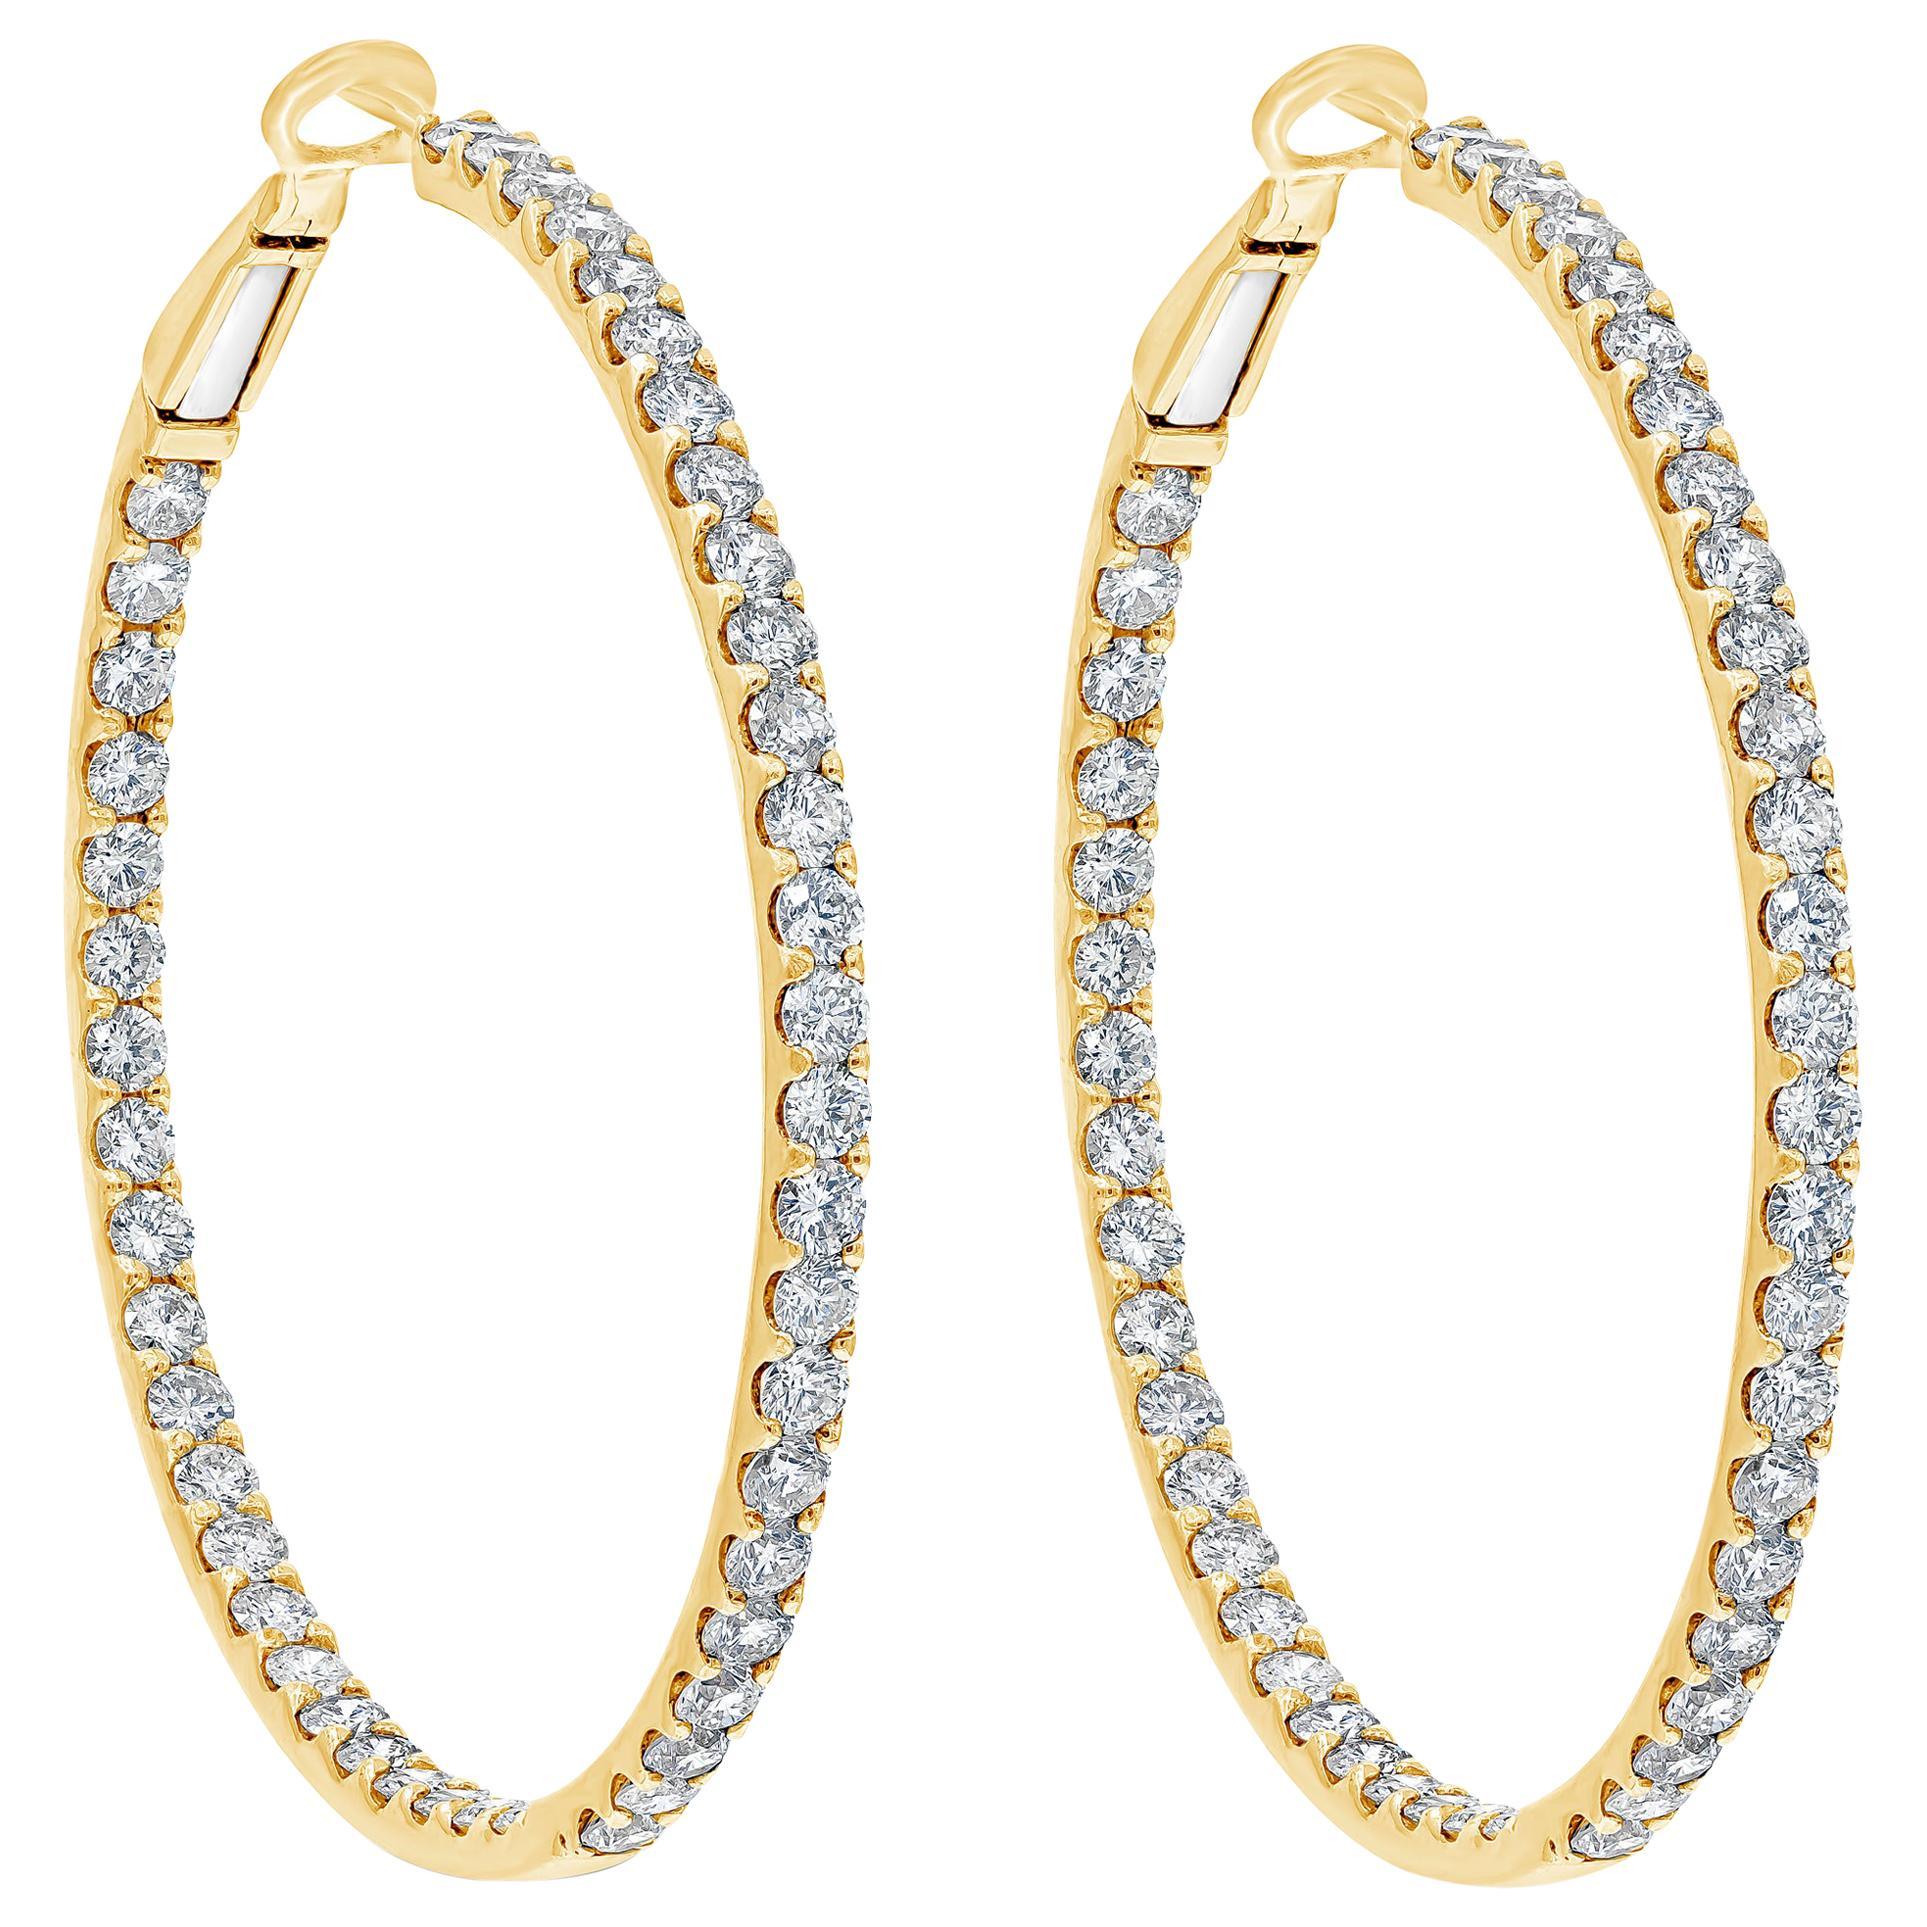 Roman Malakov, 6.08 Carat Round Brilliant Diamond Hoop Earrings